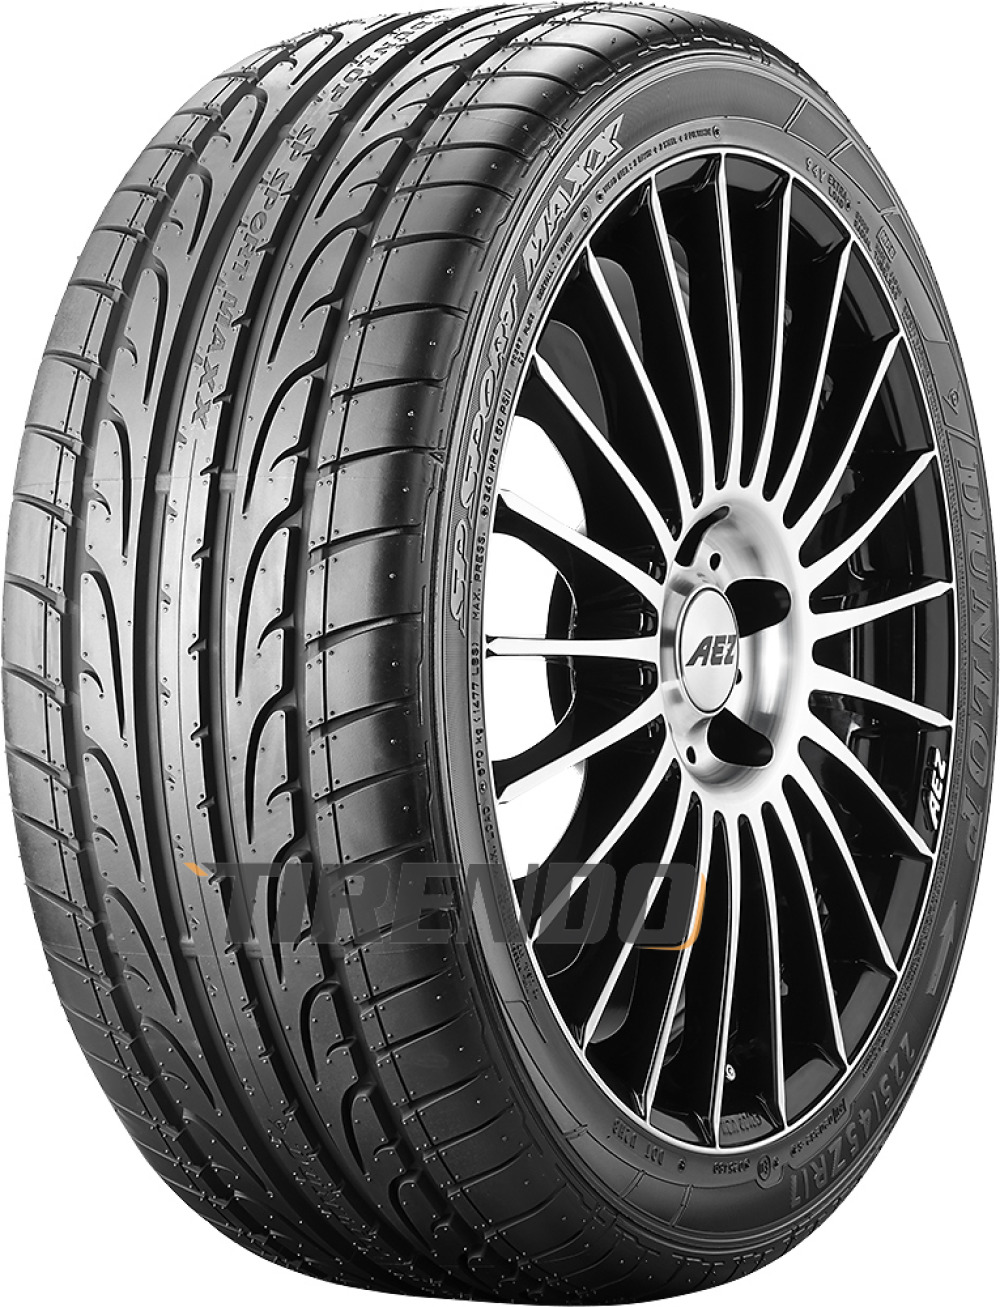 Dunlop SP Sport Maxx ( 255/35 ZR20 (97Y) XL J, mit Felgenschutz (MFS) )